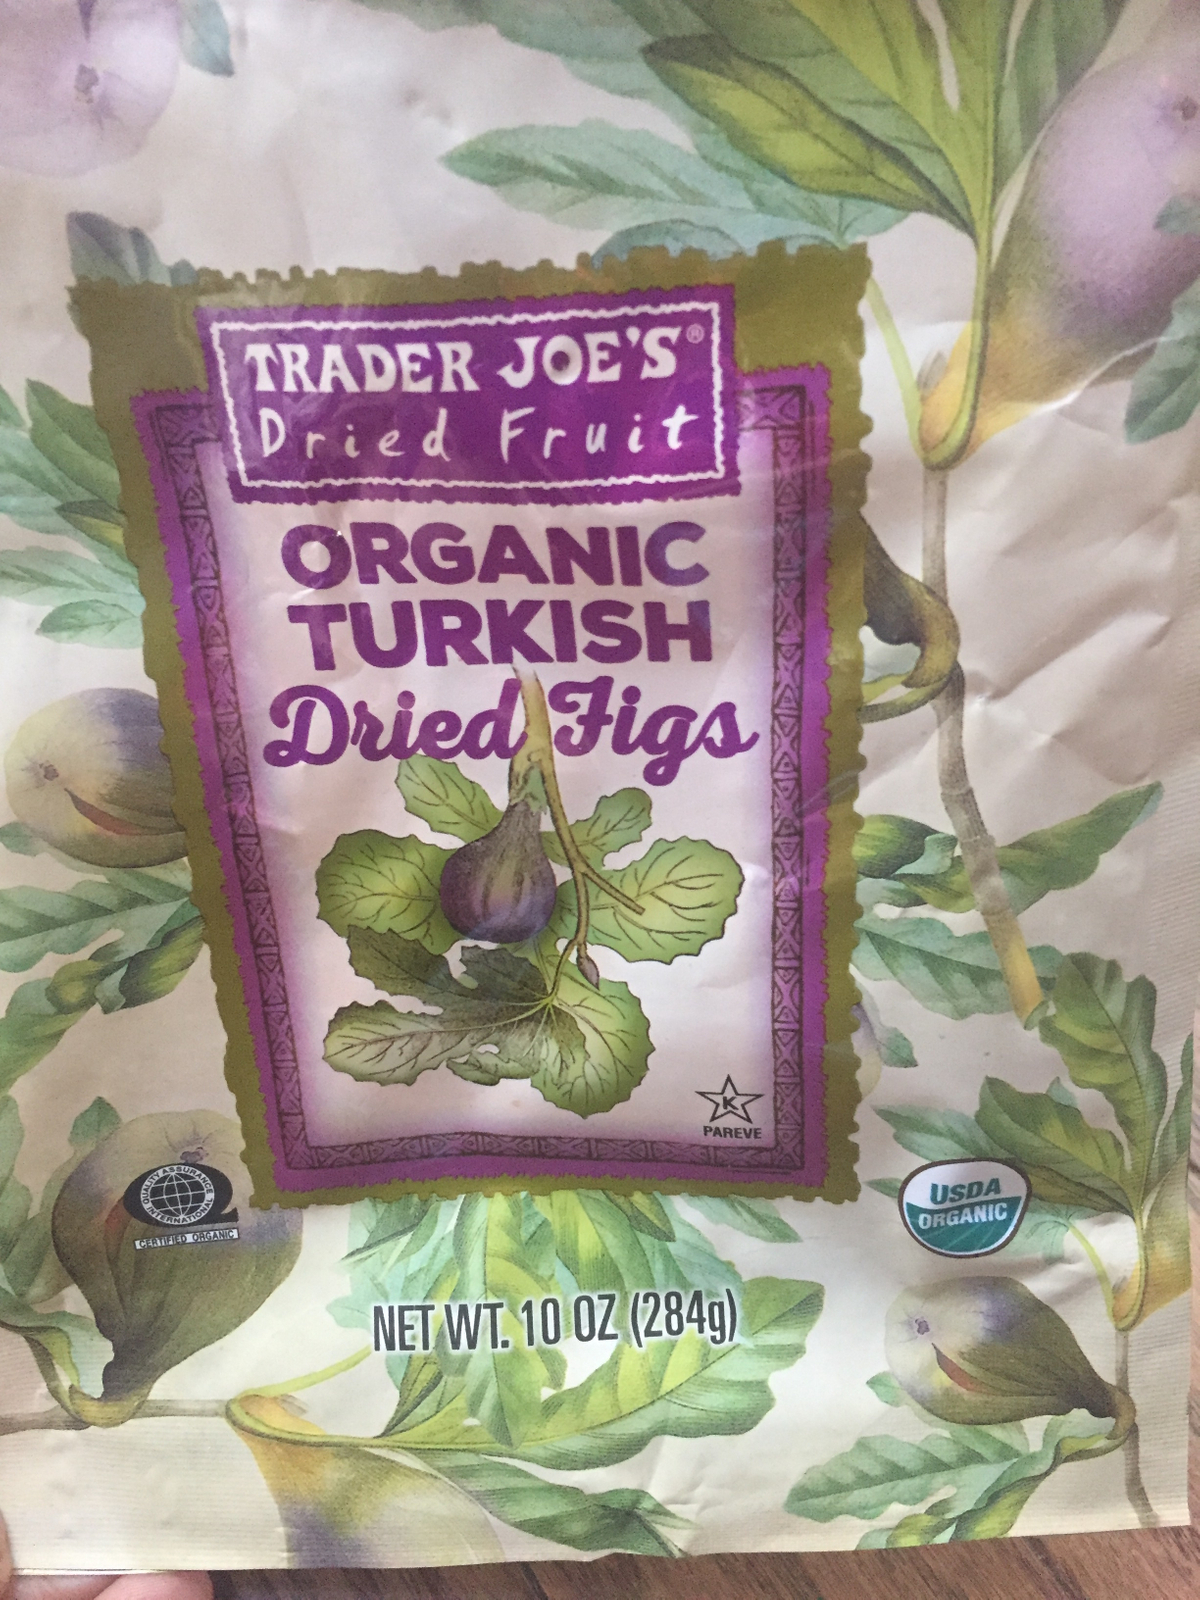 Organic Turkish Figs!